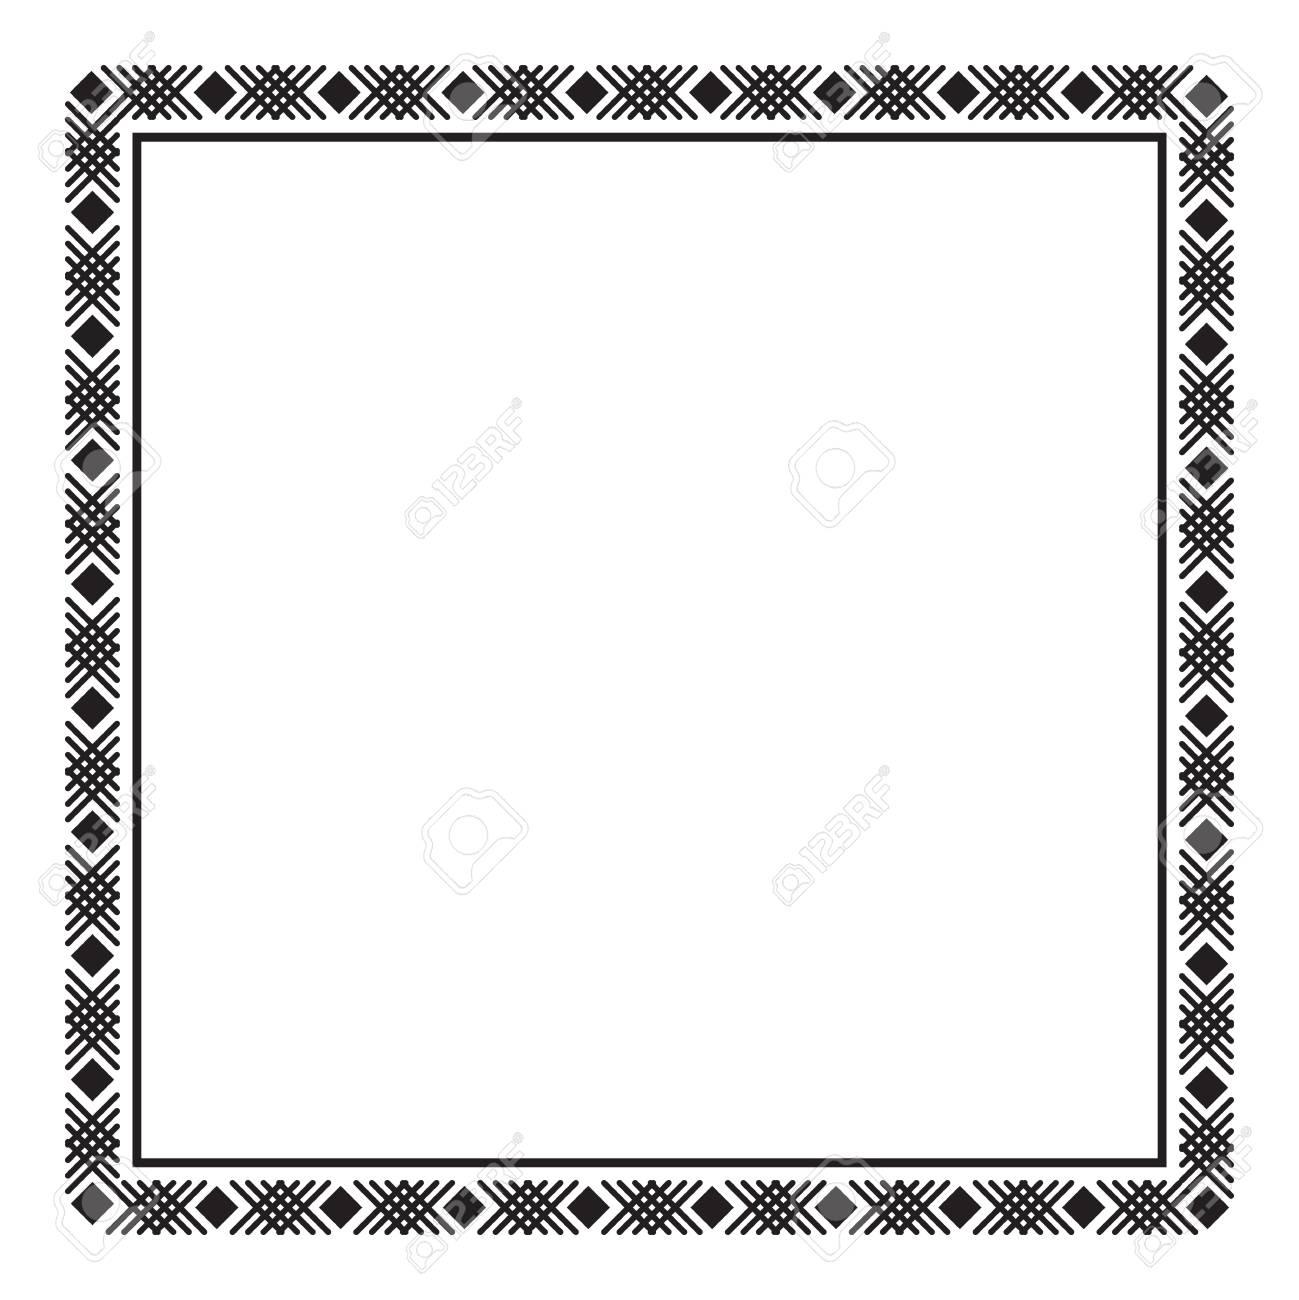 Clip Art Vector Designs